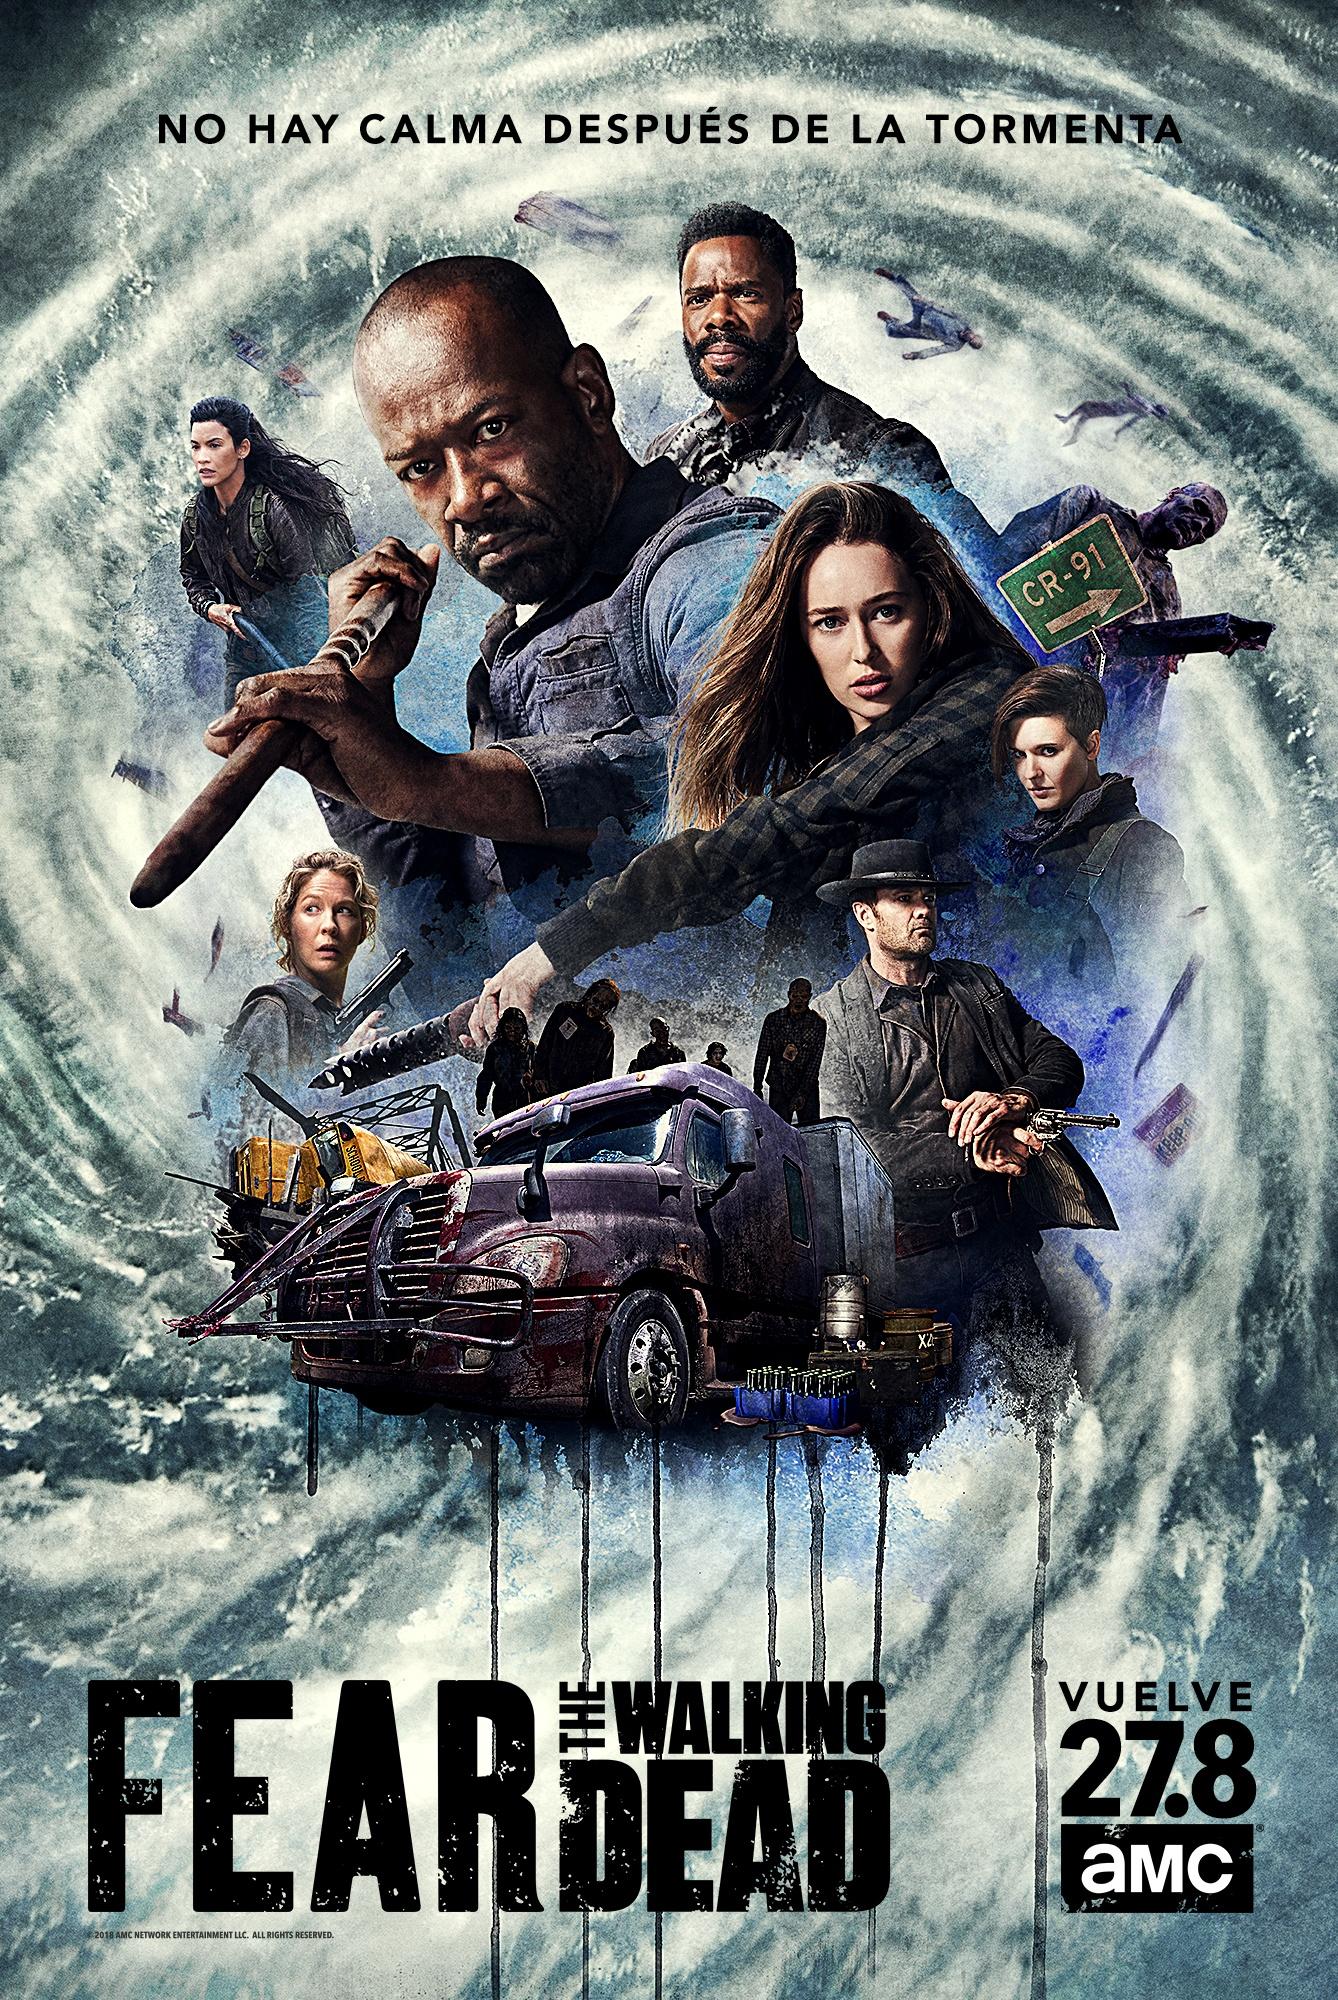 'Fear The Walking Dead' Poster Temporada 4B